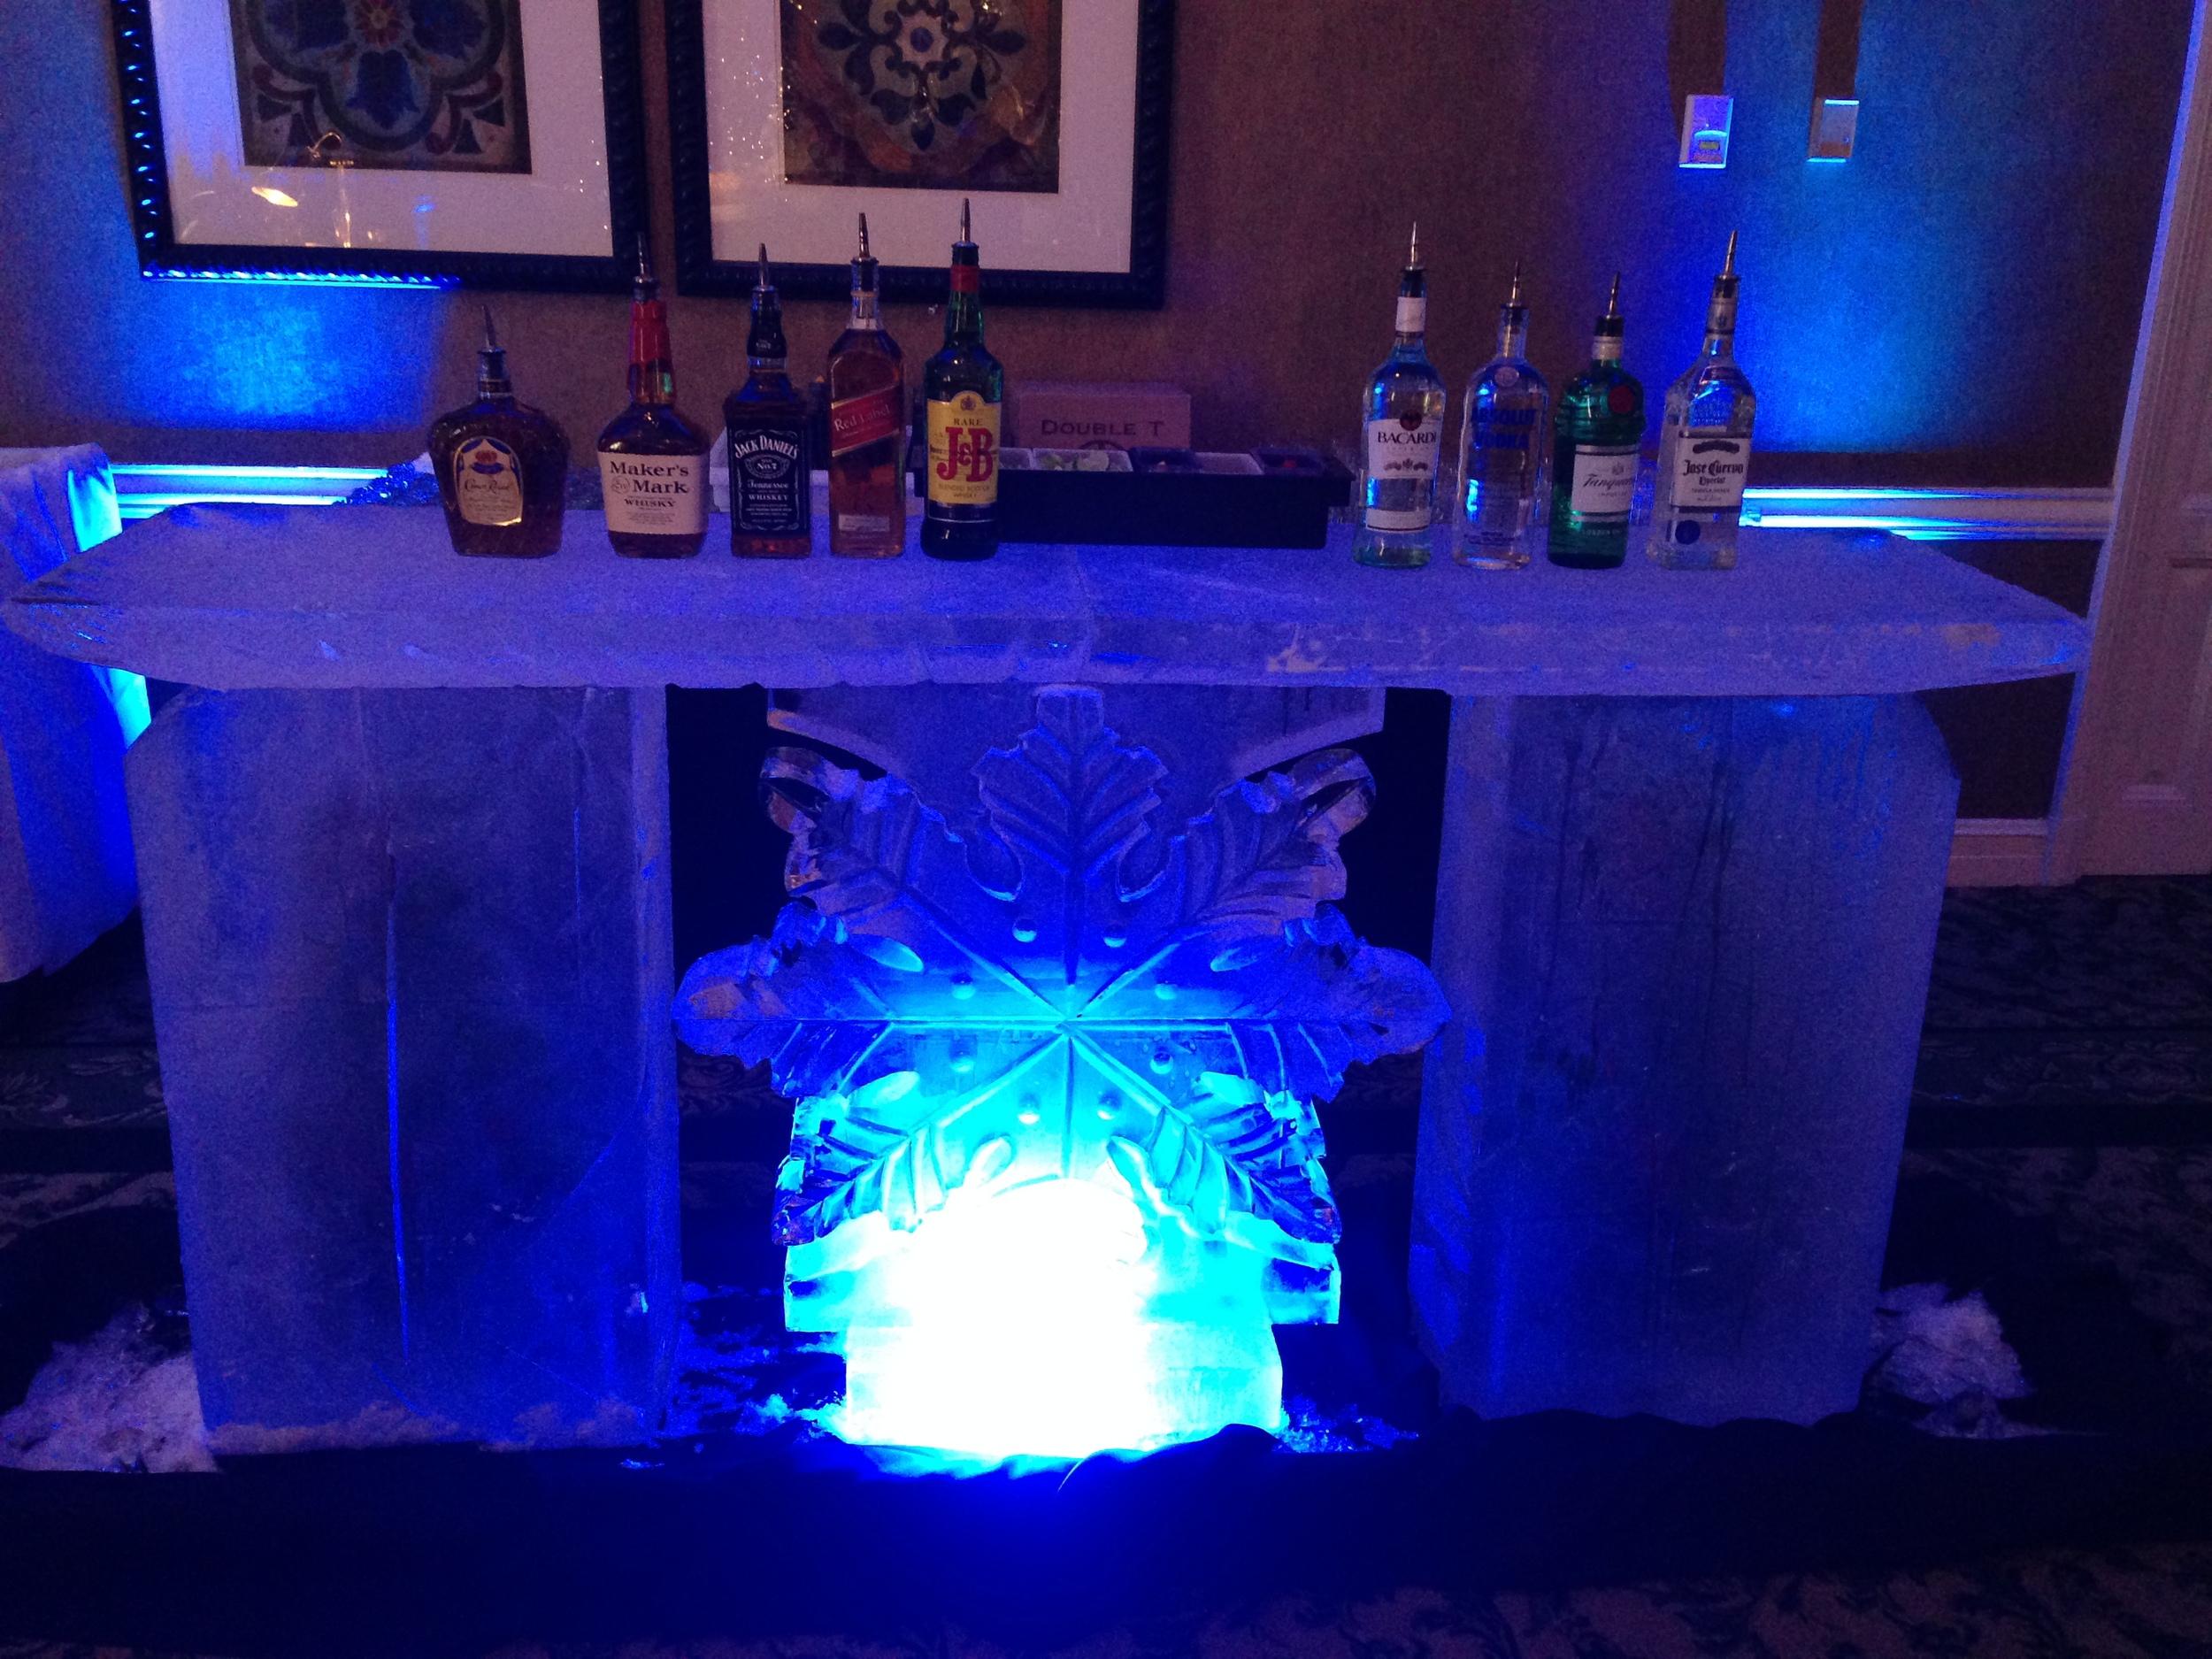 3) Winter Wonderland Themed Ice Bar